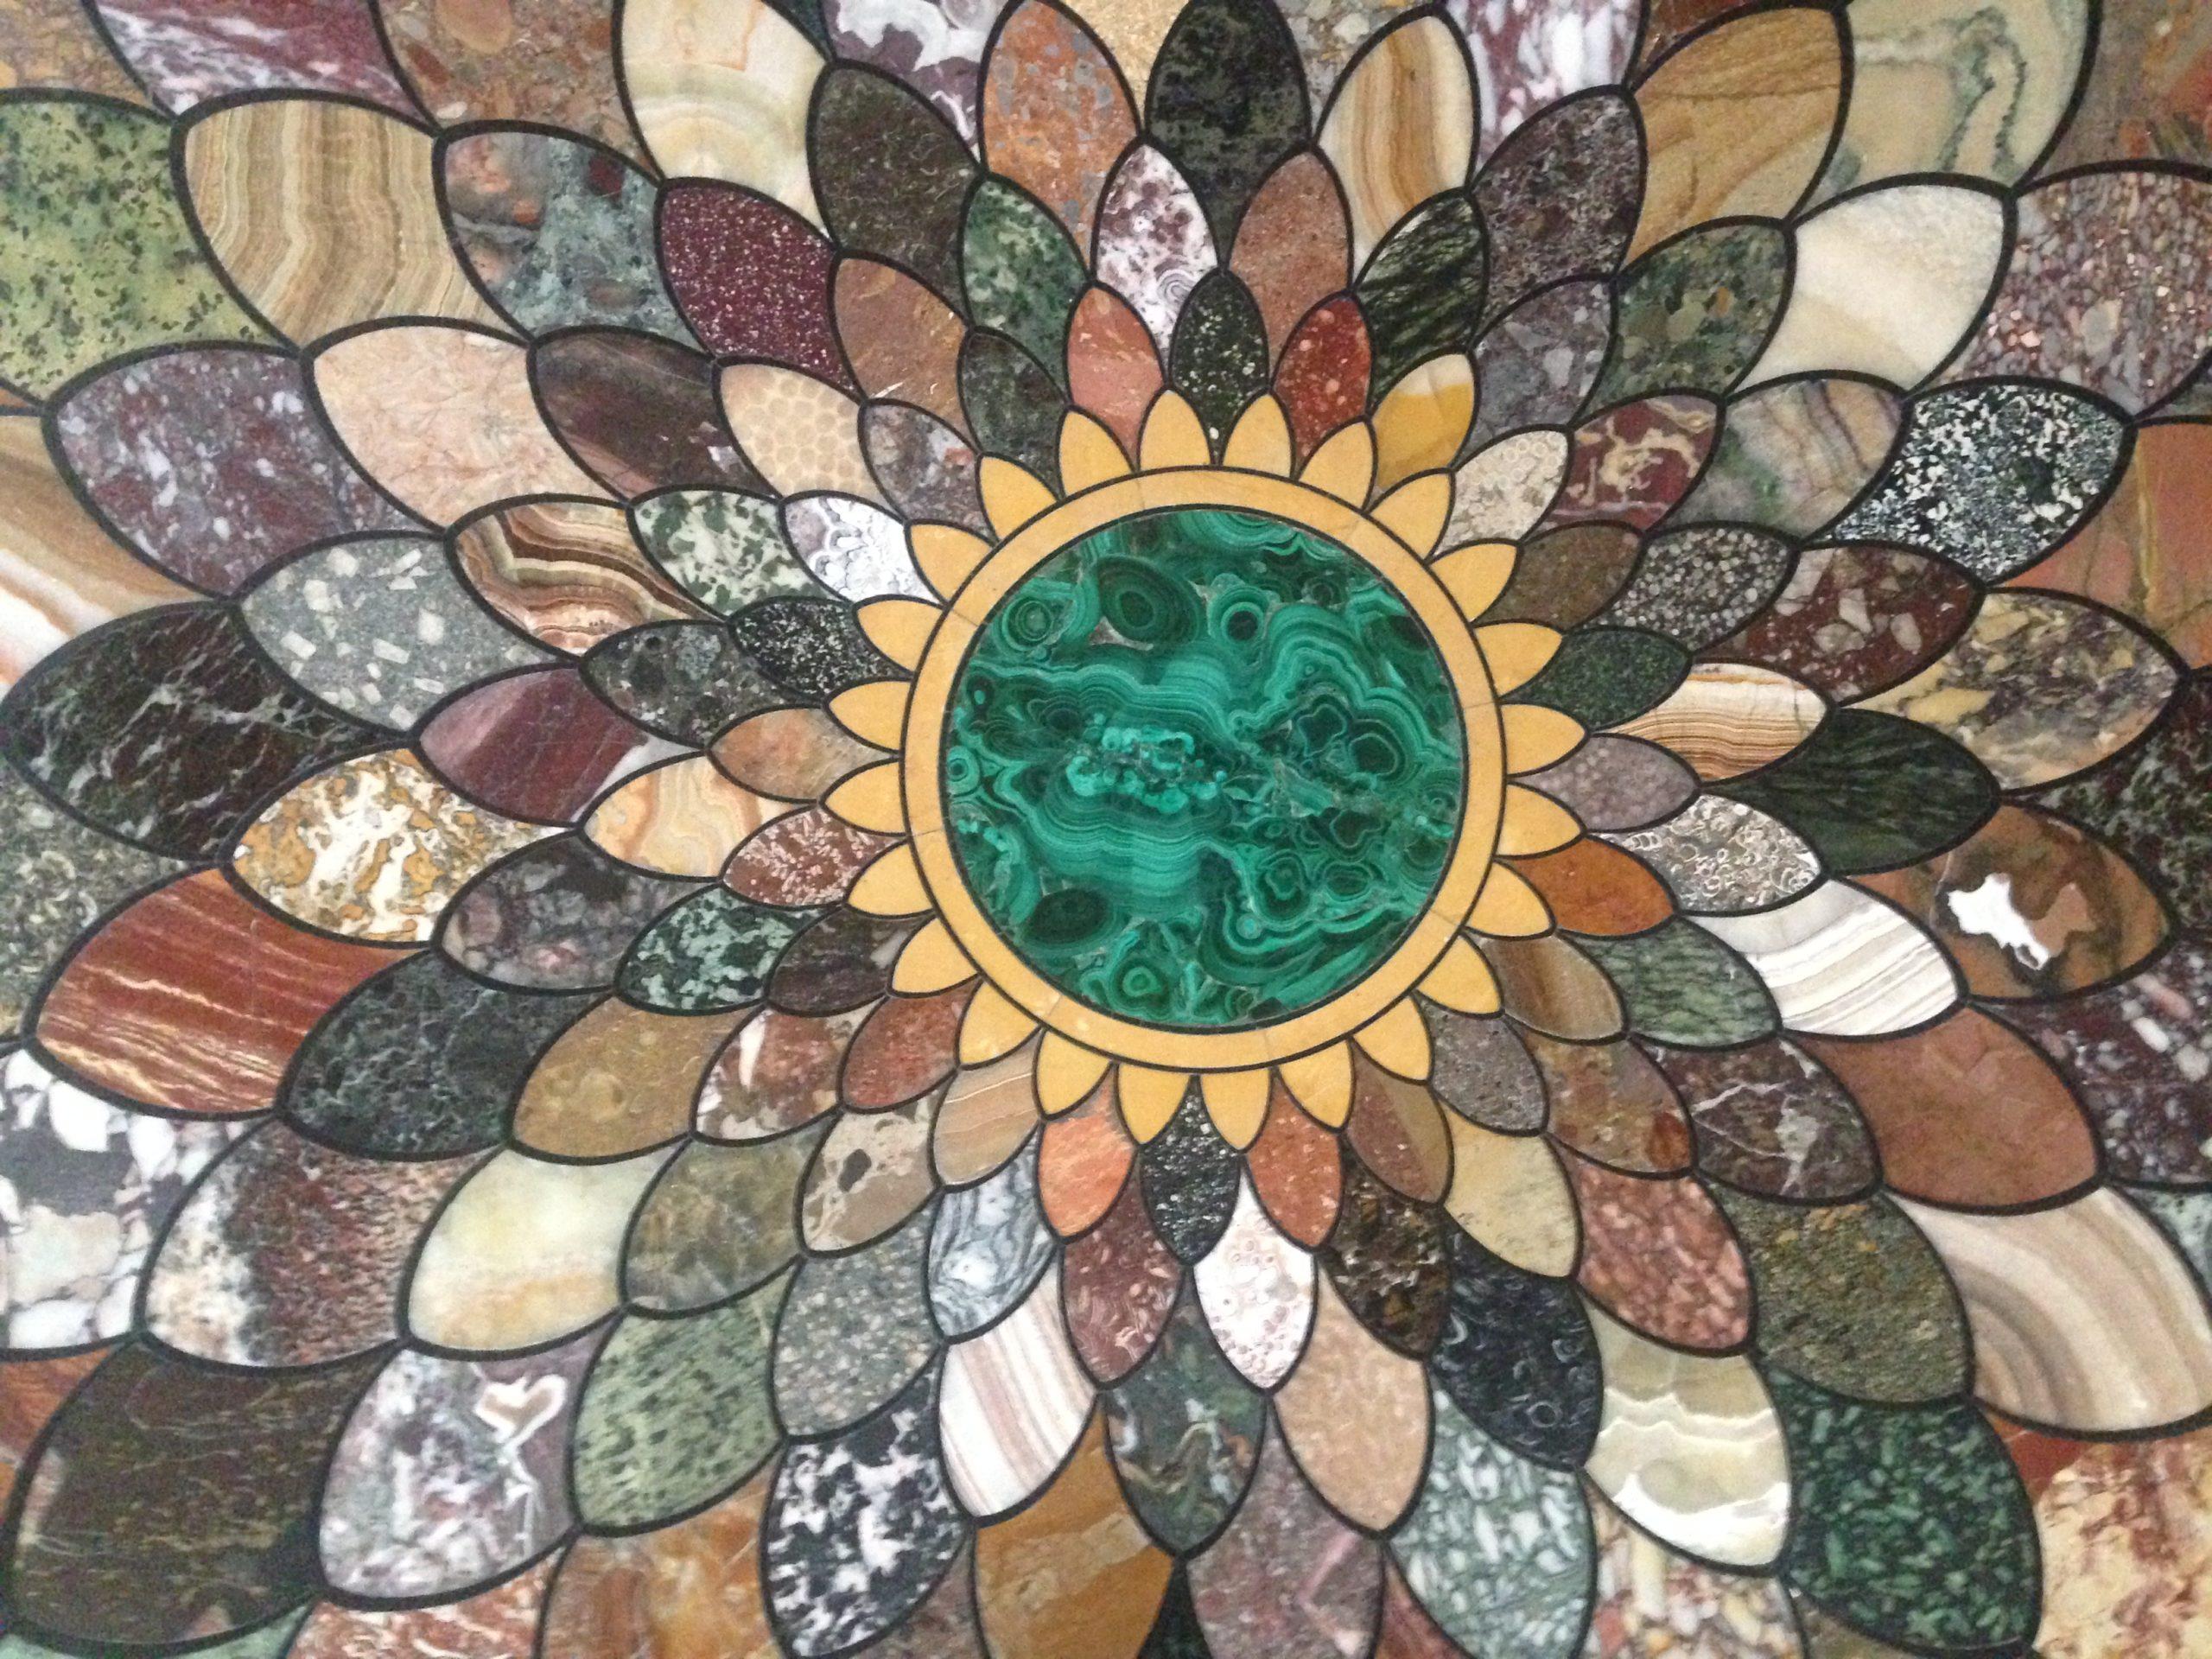 Tabletop inlaid with semi-precious stones.